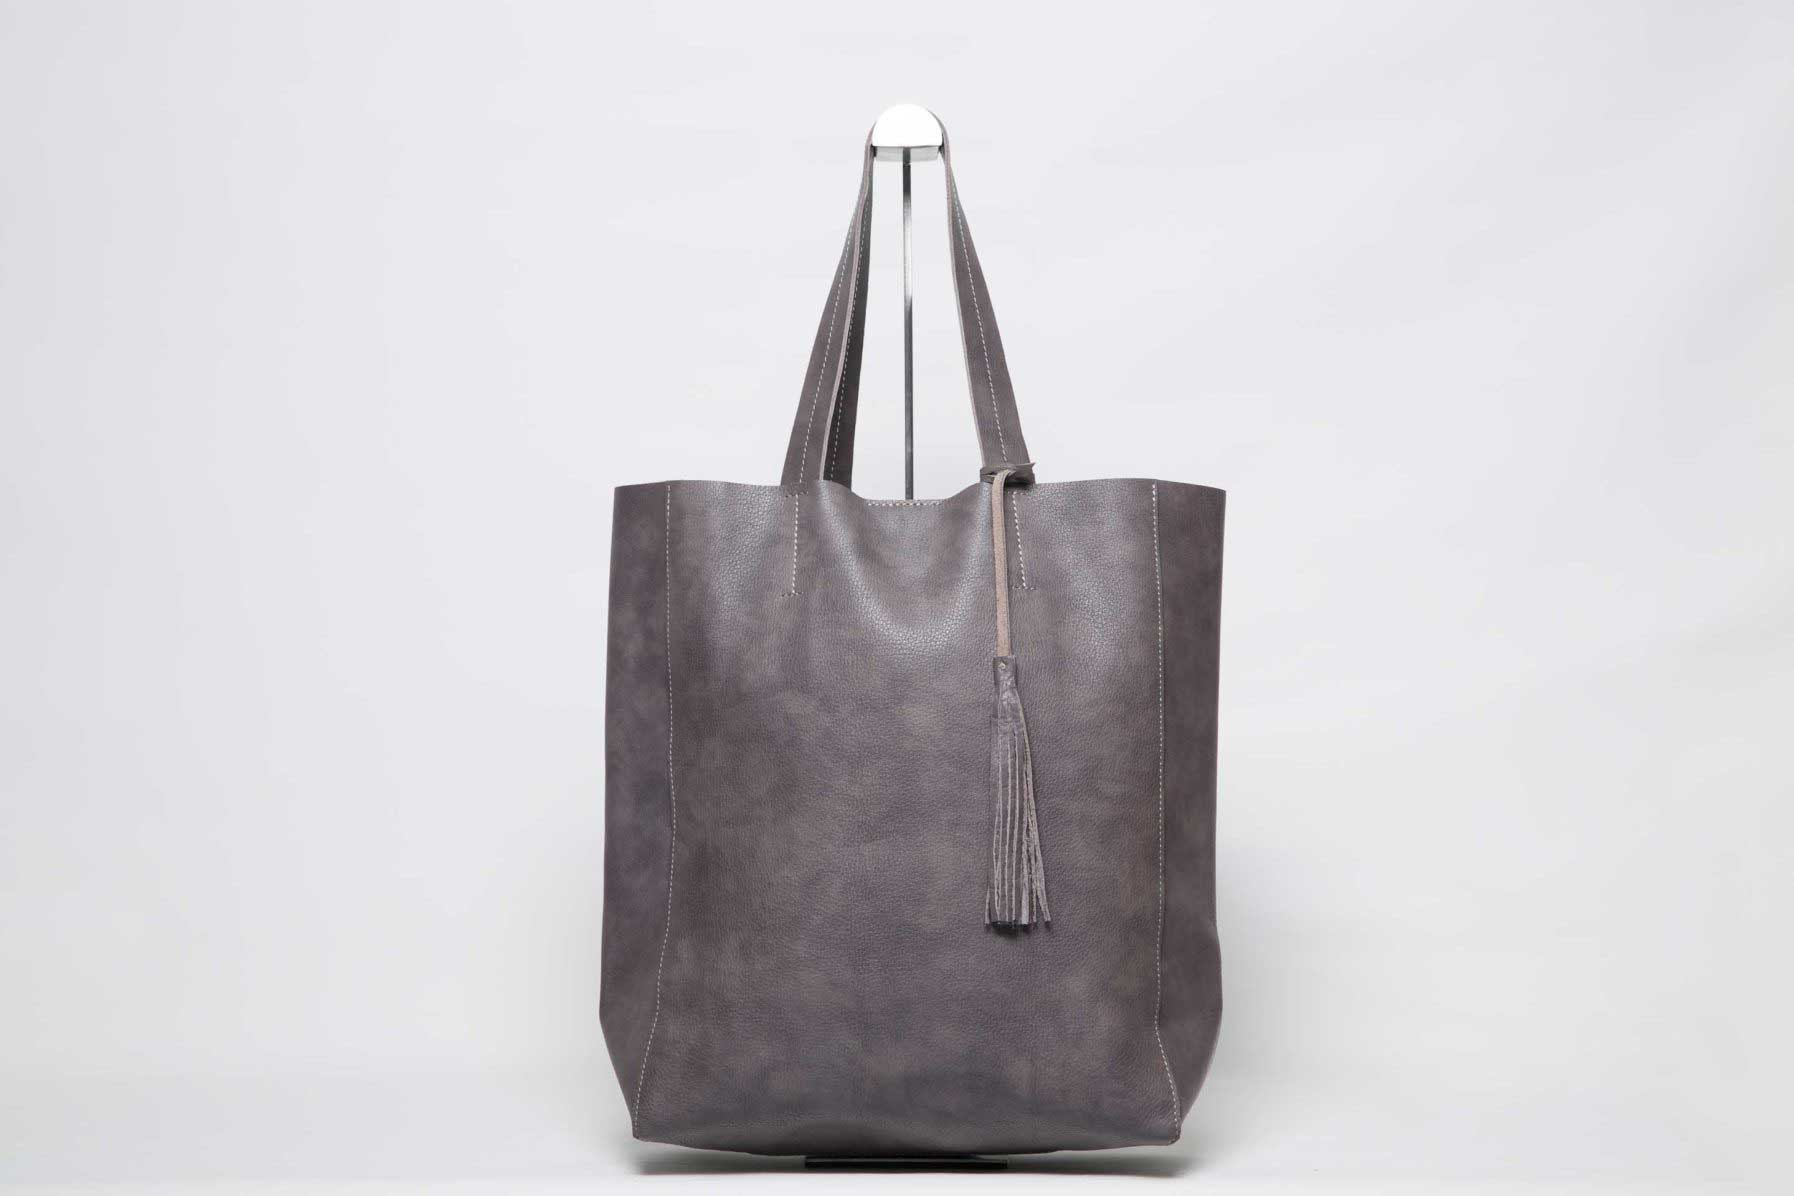 Visuel - Grand Shopper Cuir Gris-Marron avec pompon - ordinari.shop